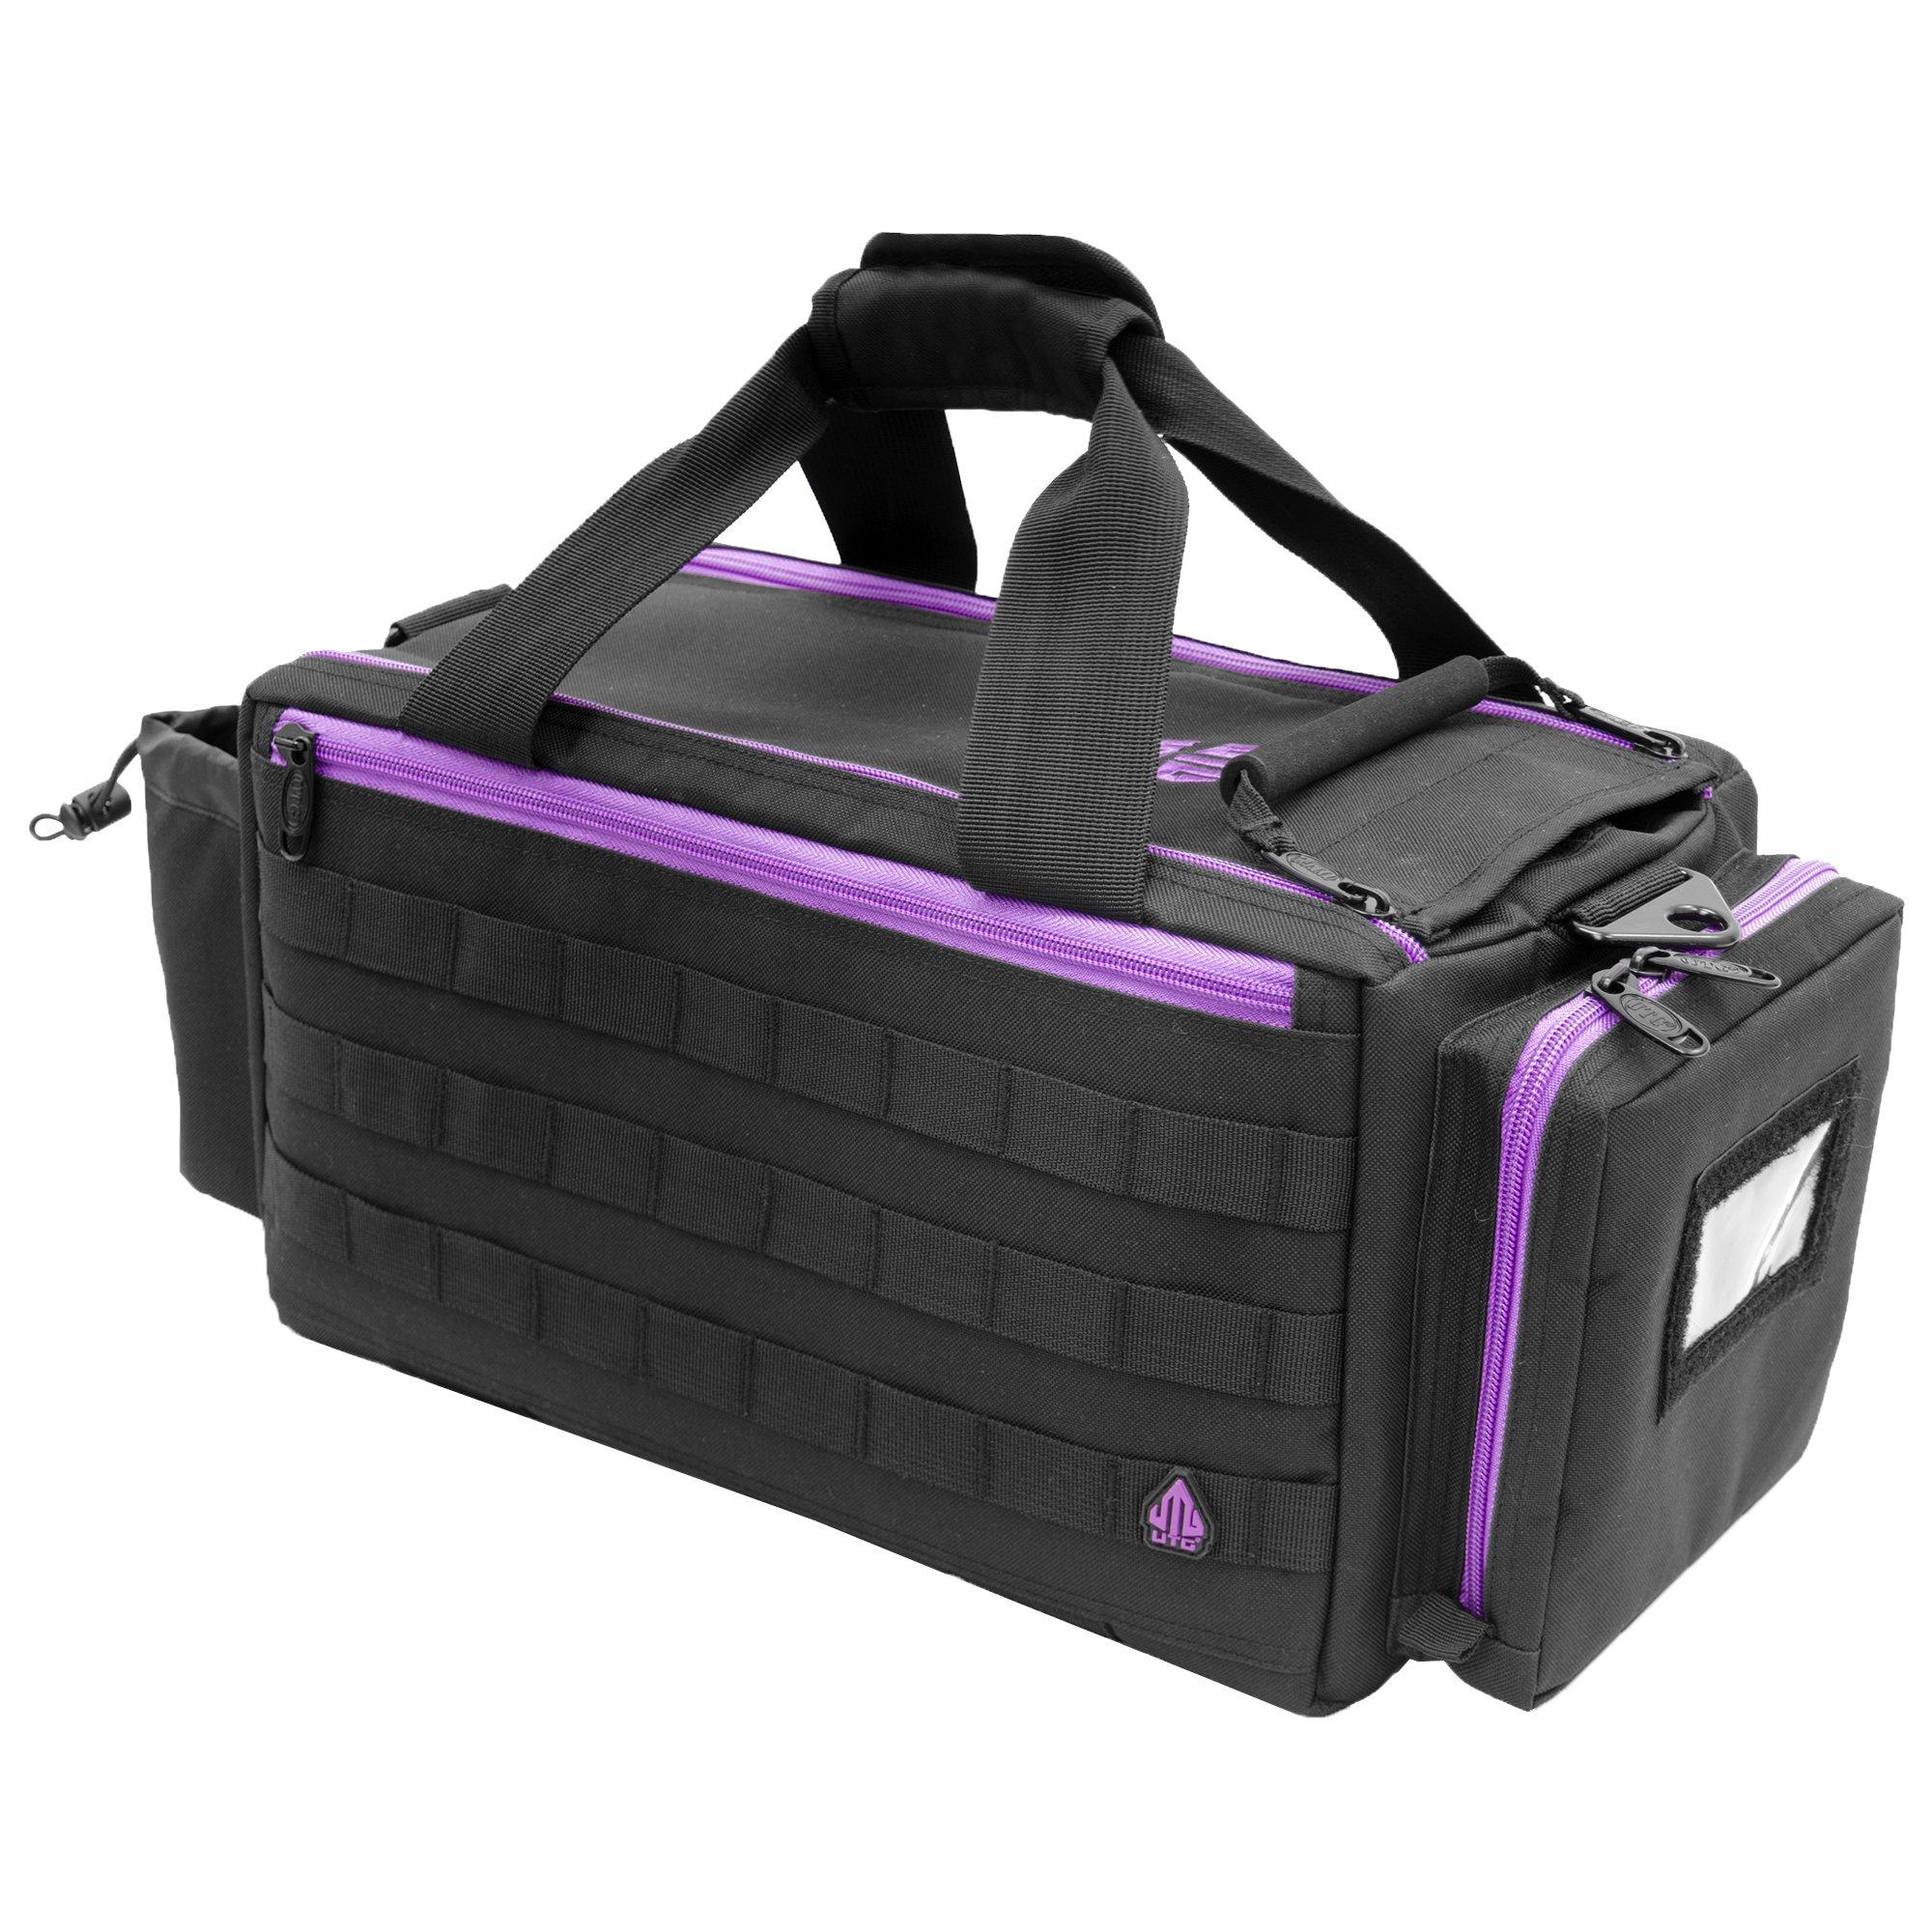 UTG All in One Range/Utility Go Bag, Black/Violet, 21'' x 10'' x 9'' by UTG (Image #2)